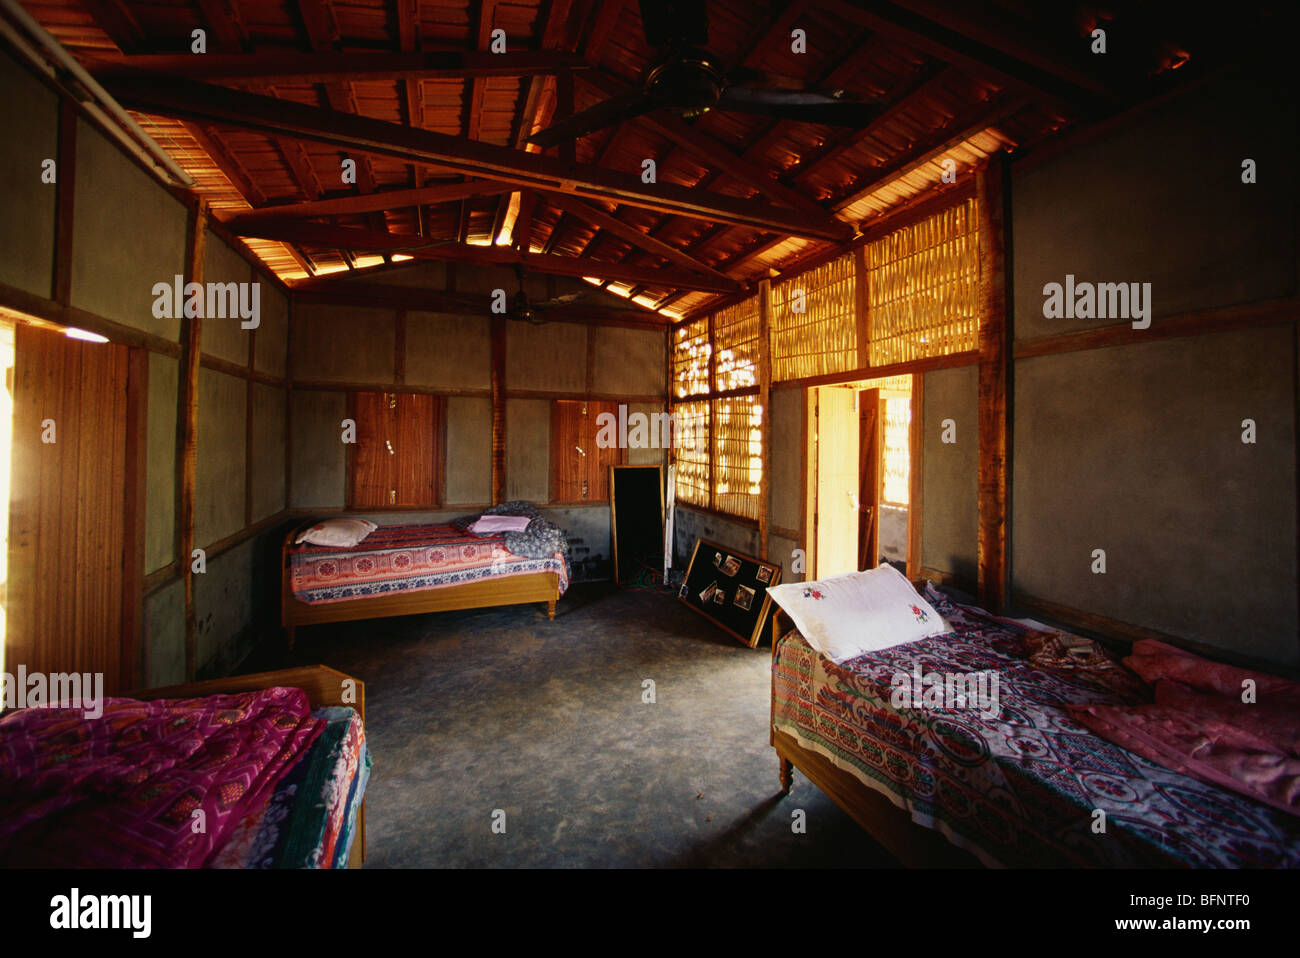 Interior of Earthquake proof house ; Bhuj ; Kutch ; Gujarat ; India - Stock Image